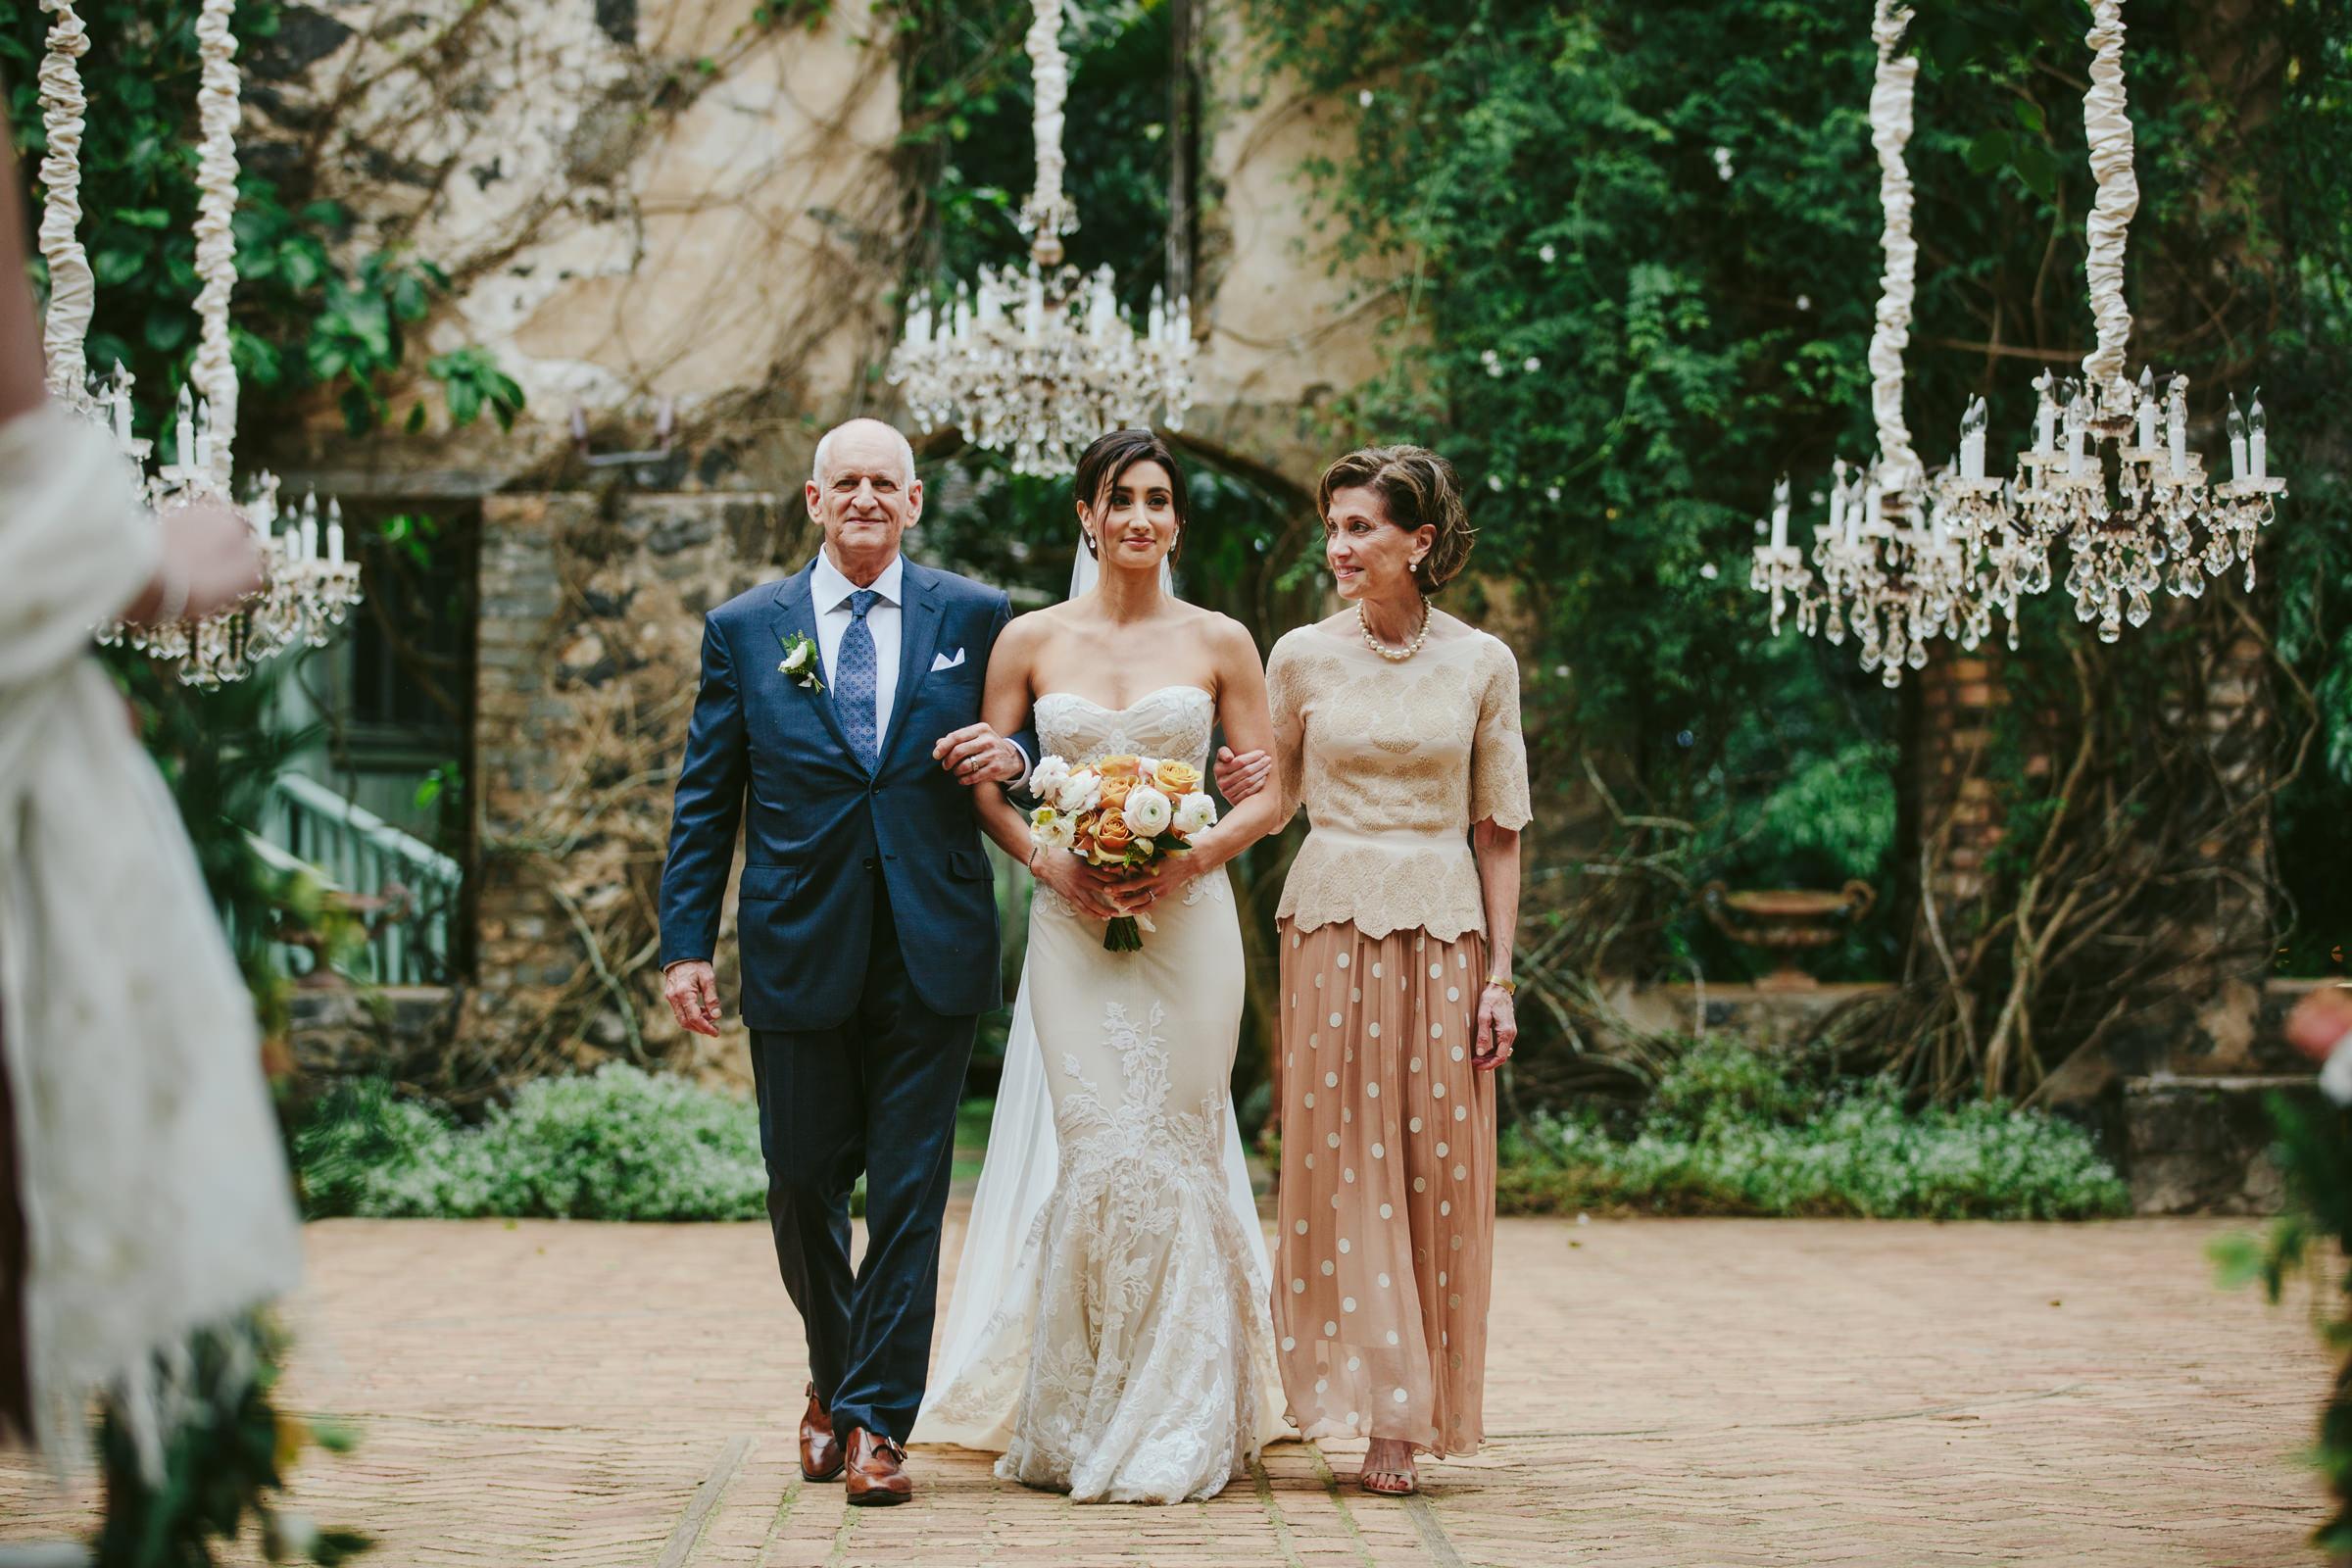 Haiku Mill maui bridal portrait with her parents - photo by Melia Lucida